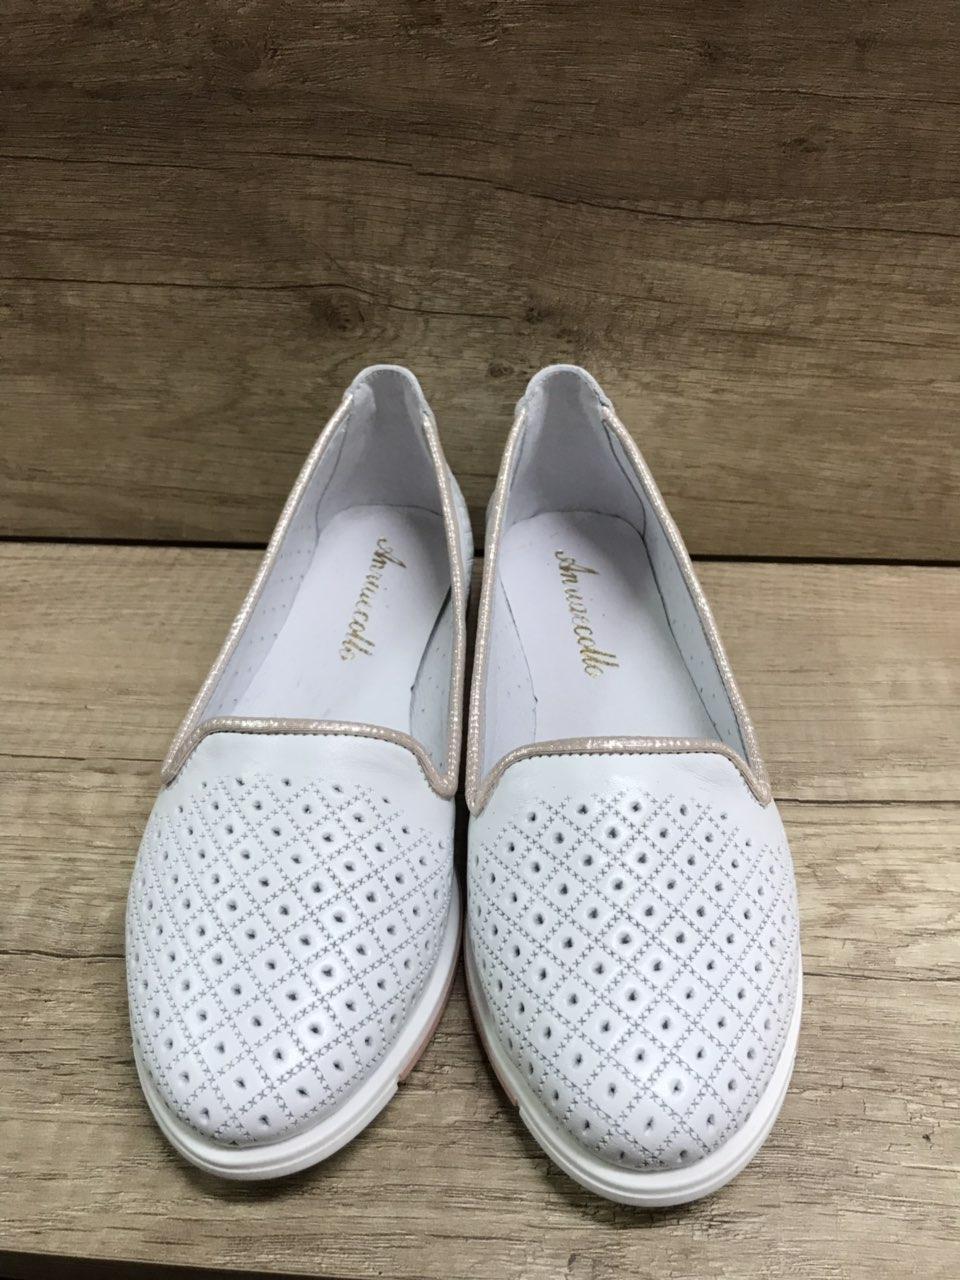 Летние женские туфли Anri de collo